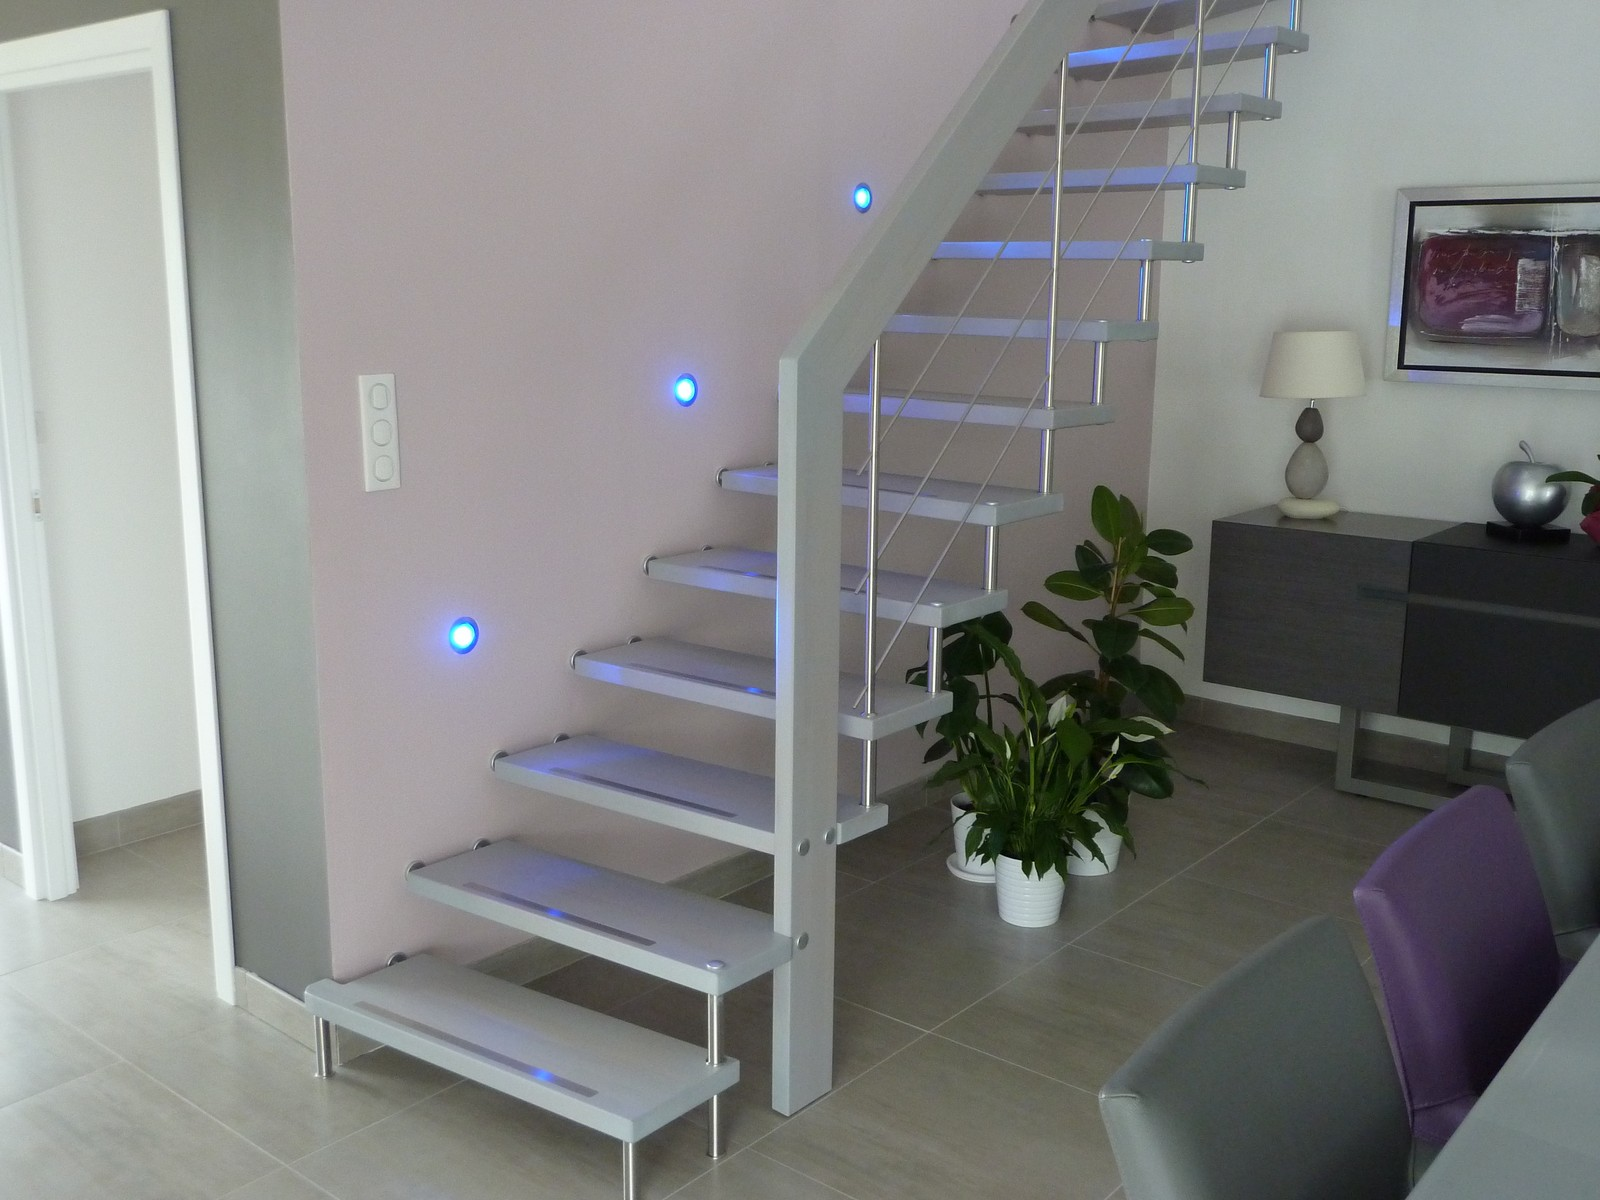 pin escalier suspendu quart tournant a bastingage laque. Black Bedroom Furniture Sets. Home Design Ideas